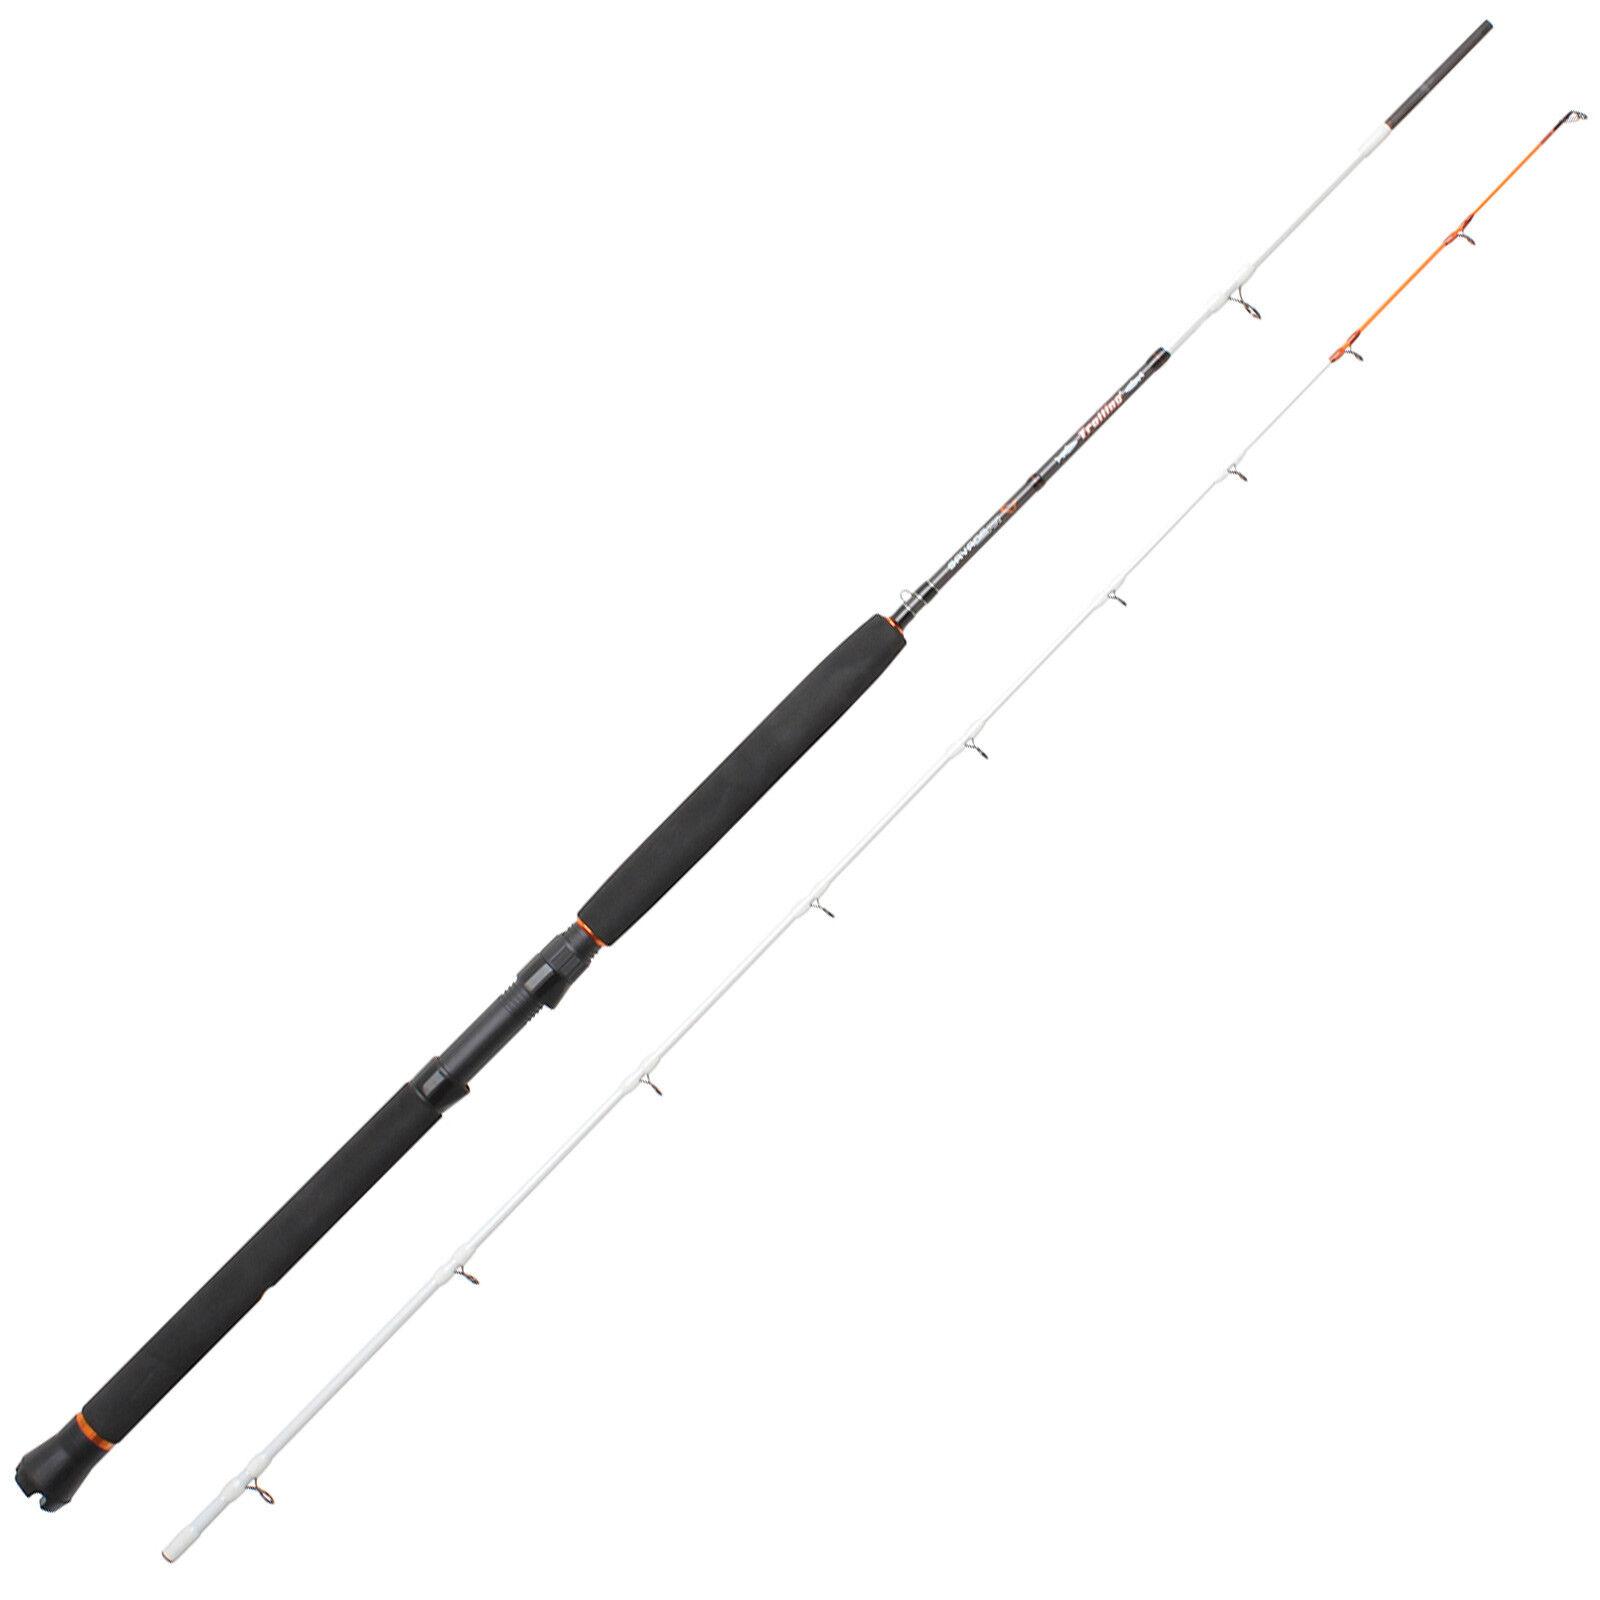 Savage Gear canna da pesca trollingruteTROLLING 2 8' 243cm 1225lbs 2 pezzi